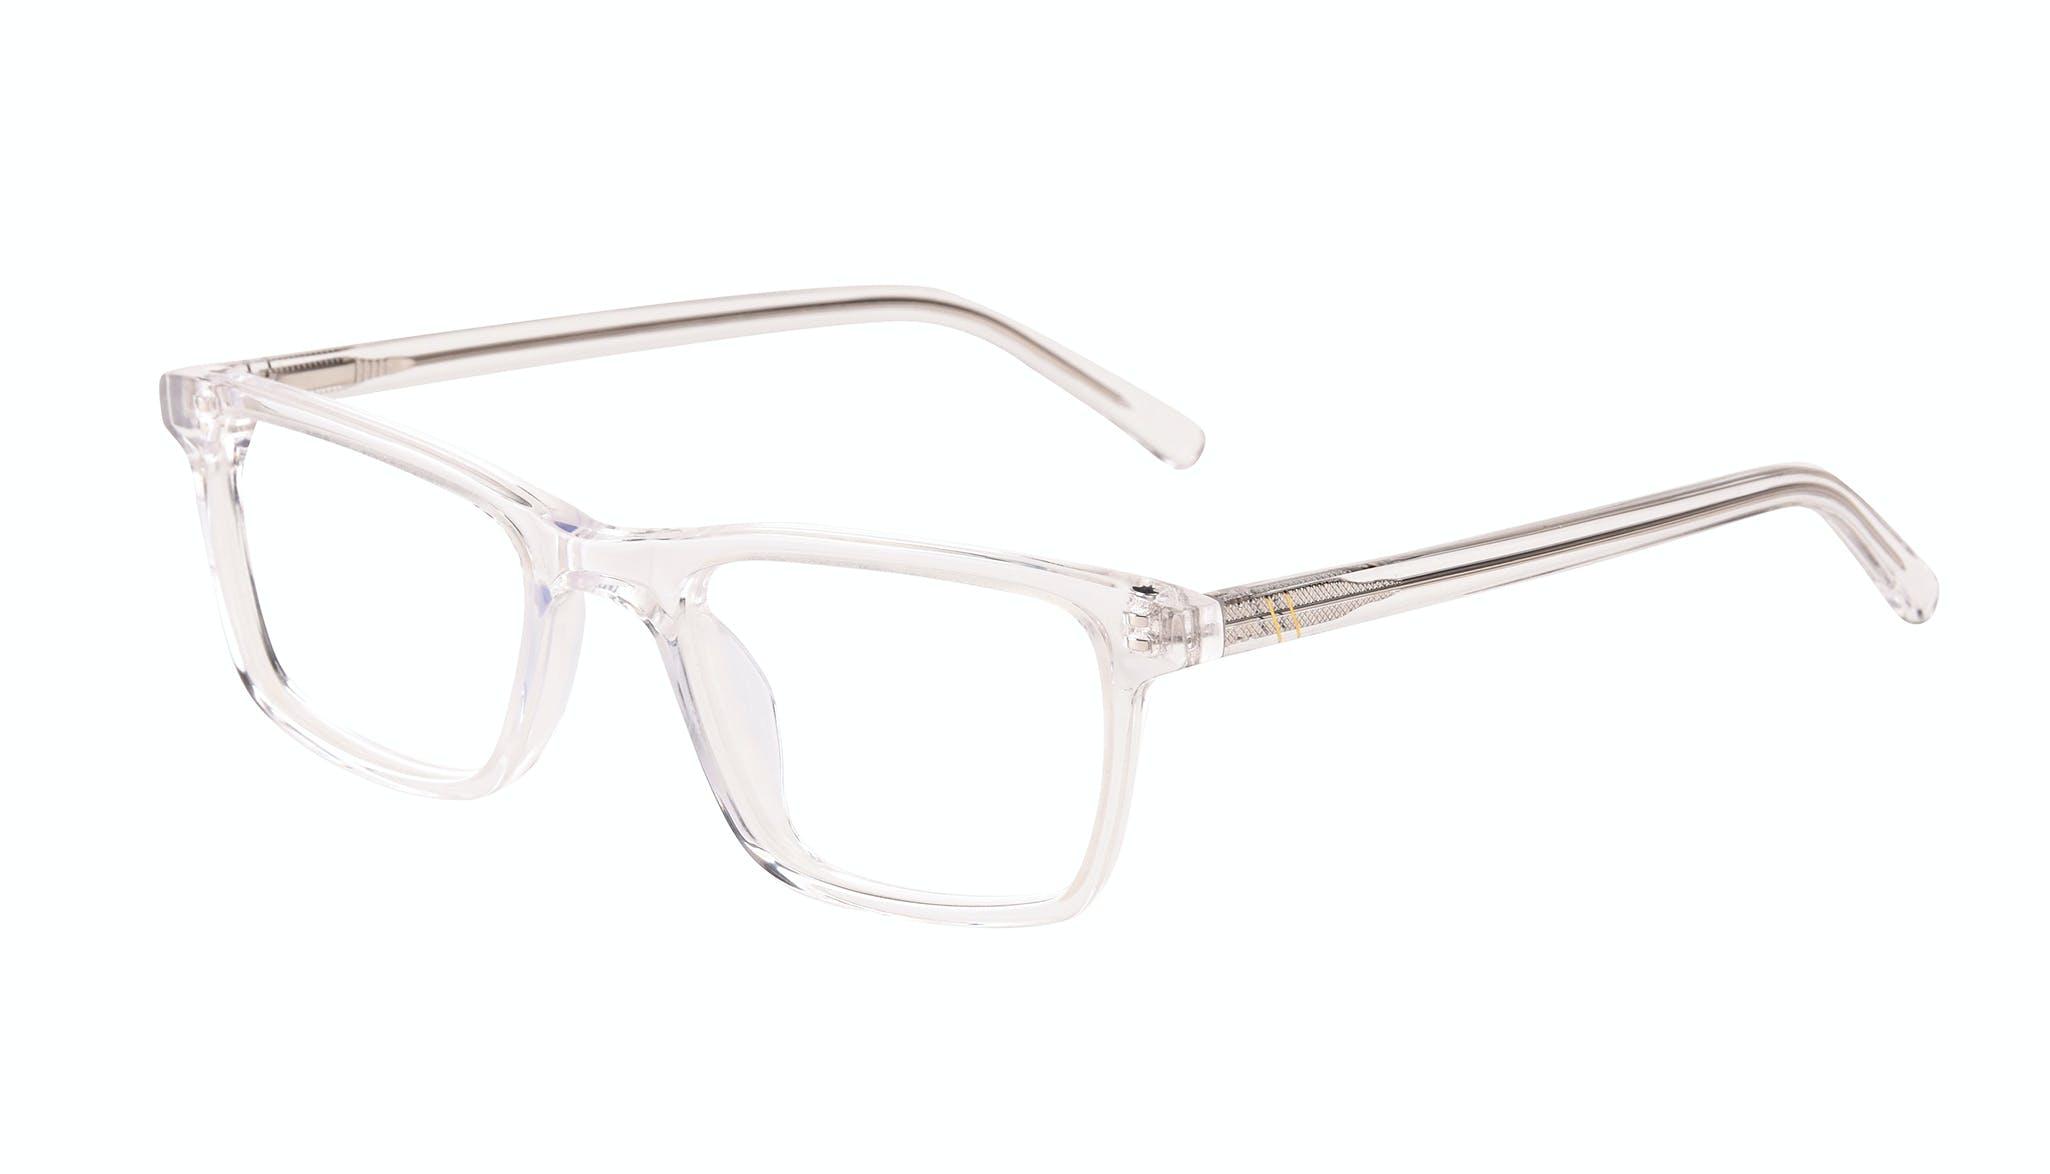 Affordable Fashion Glasses Rectangle Eyeglasses Men Henri SML Clear Tilt